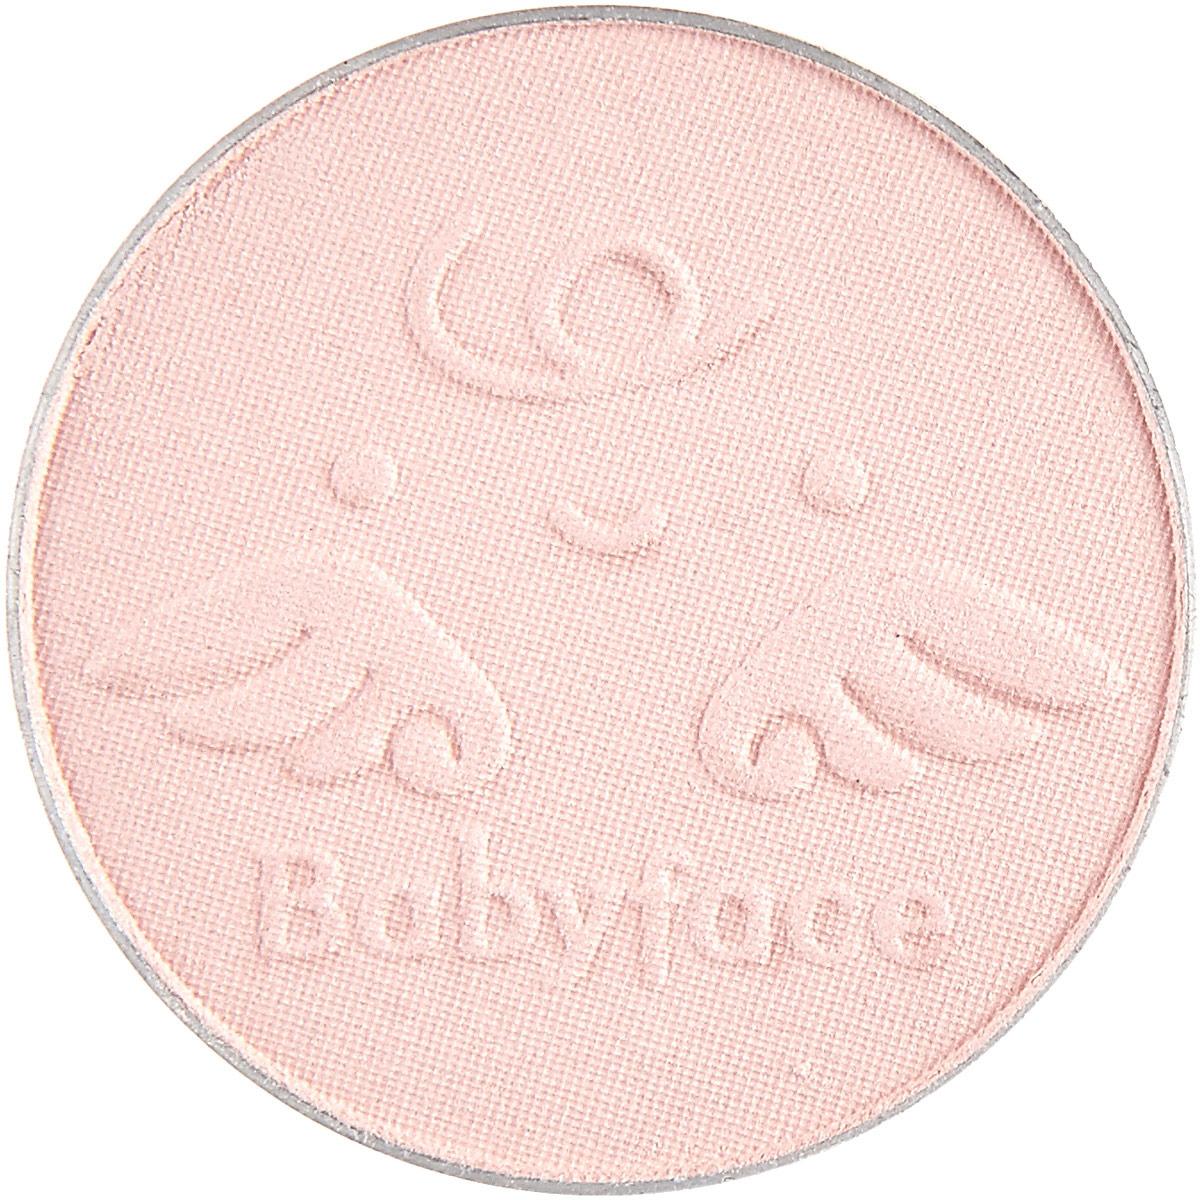 цены Хайлайтер It's Skin Babyface Petit Highlighter, тон 01 Pink Satin, 4 г